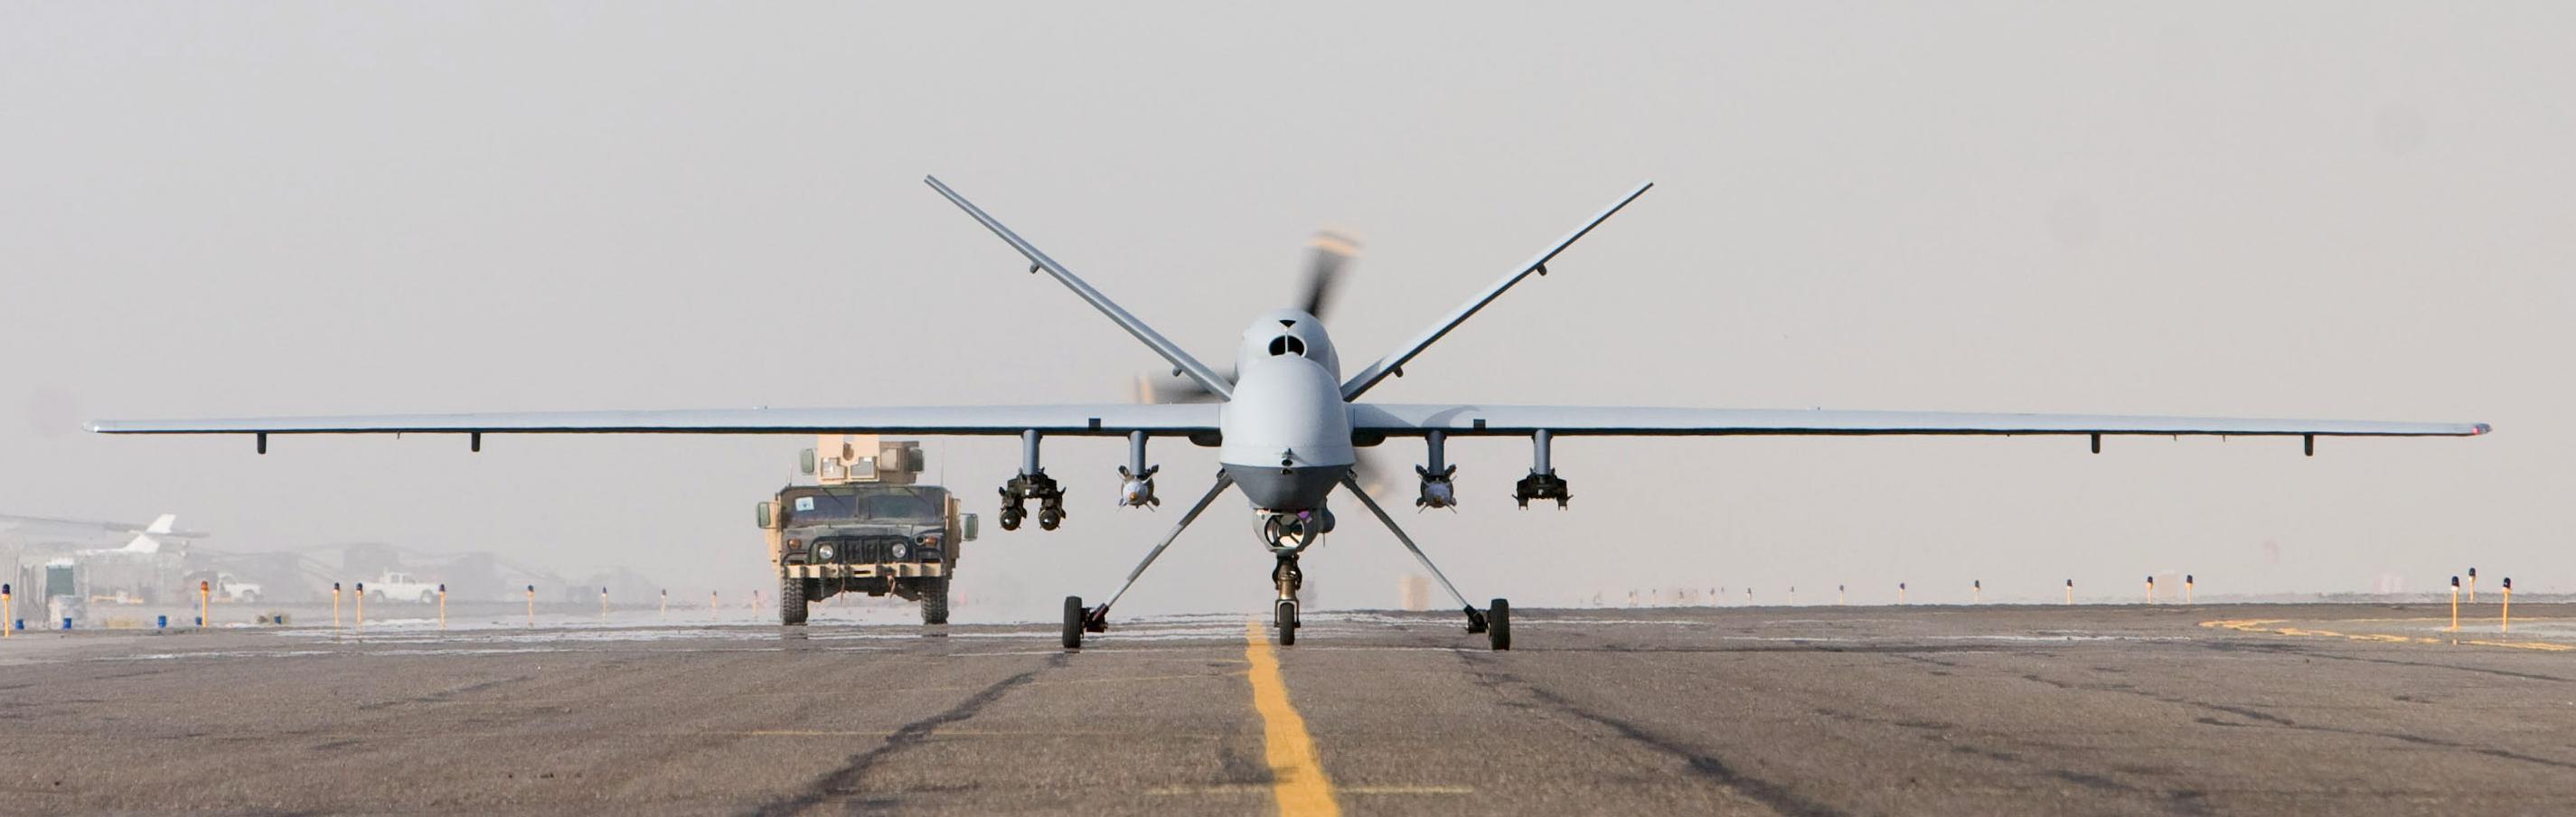 MQ-9_Afghanistan_takeoff_1_Oct_07.jpg